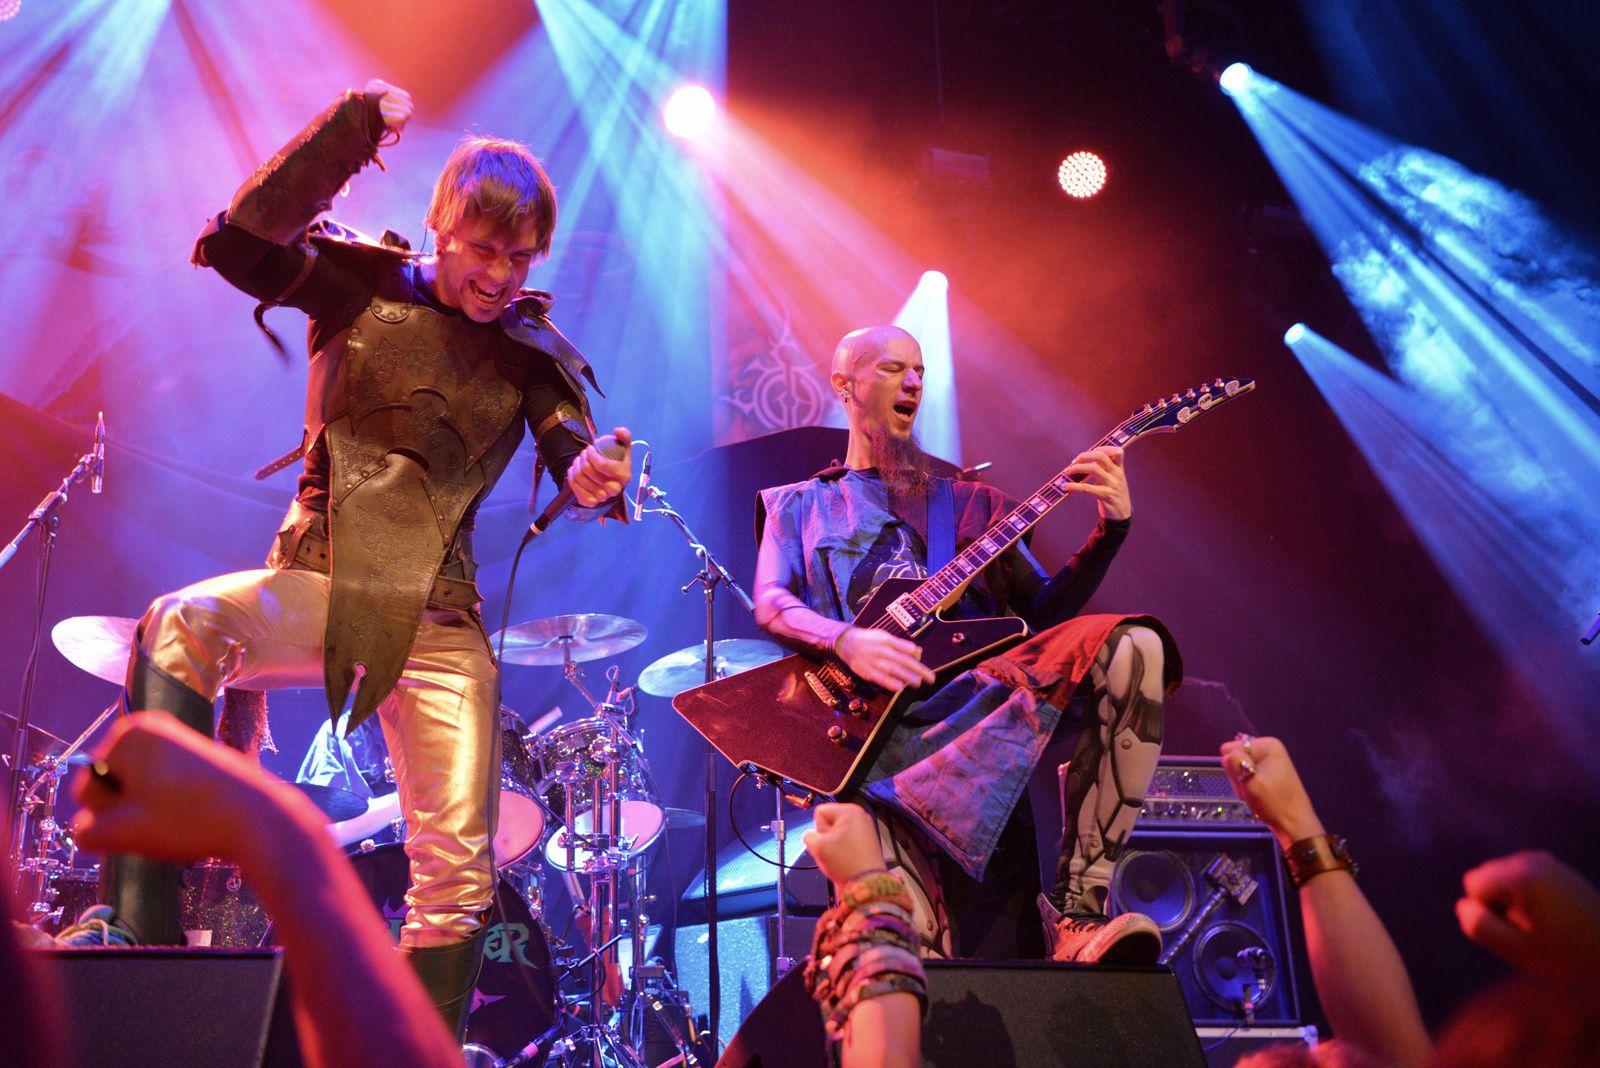 Live review HAMMERFALL/GLORYHAMMER/LANCER, TivoliVredenburg, Utrecht, 16.01.2017